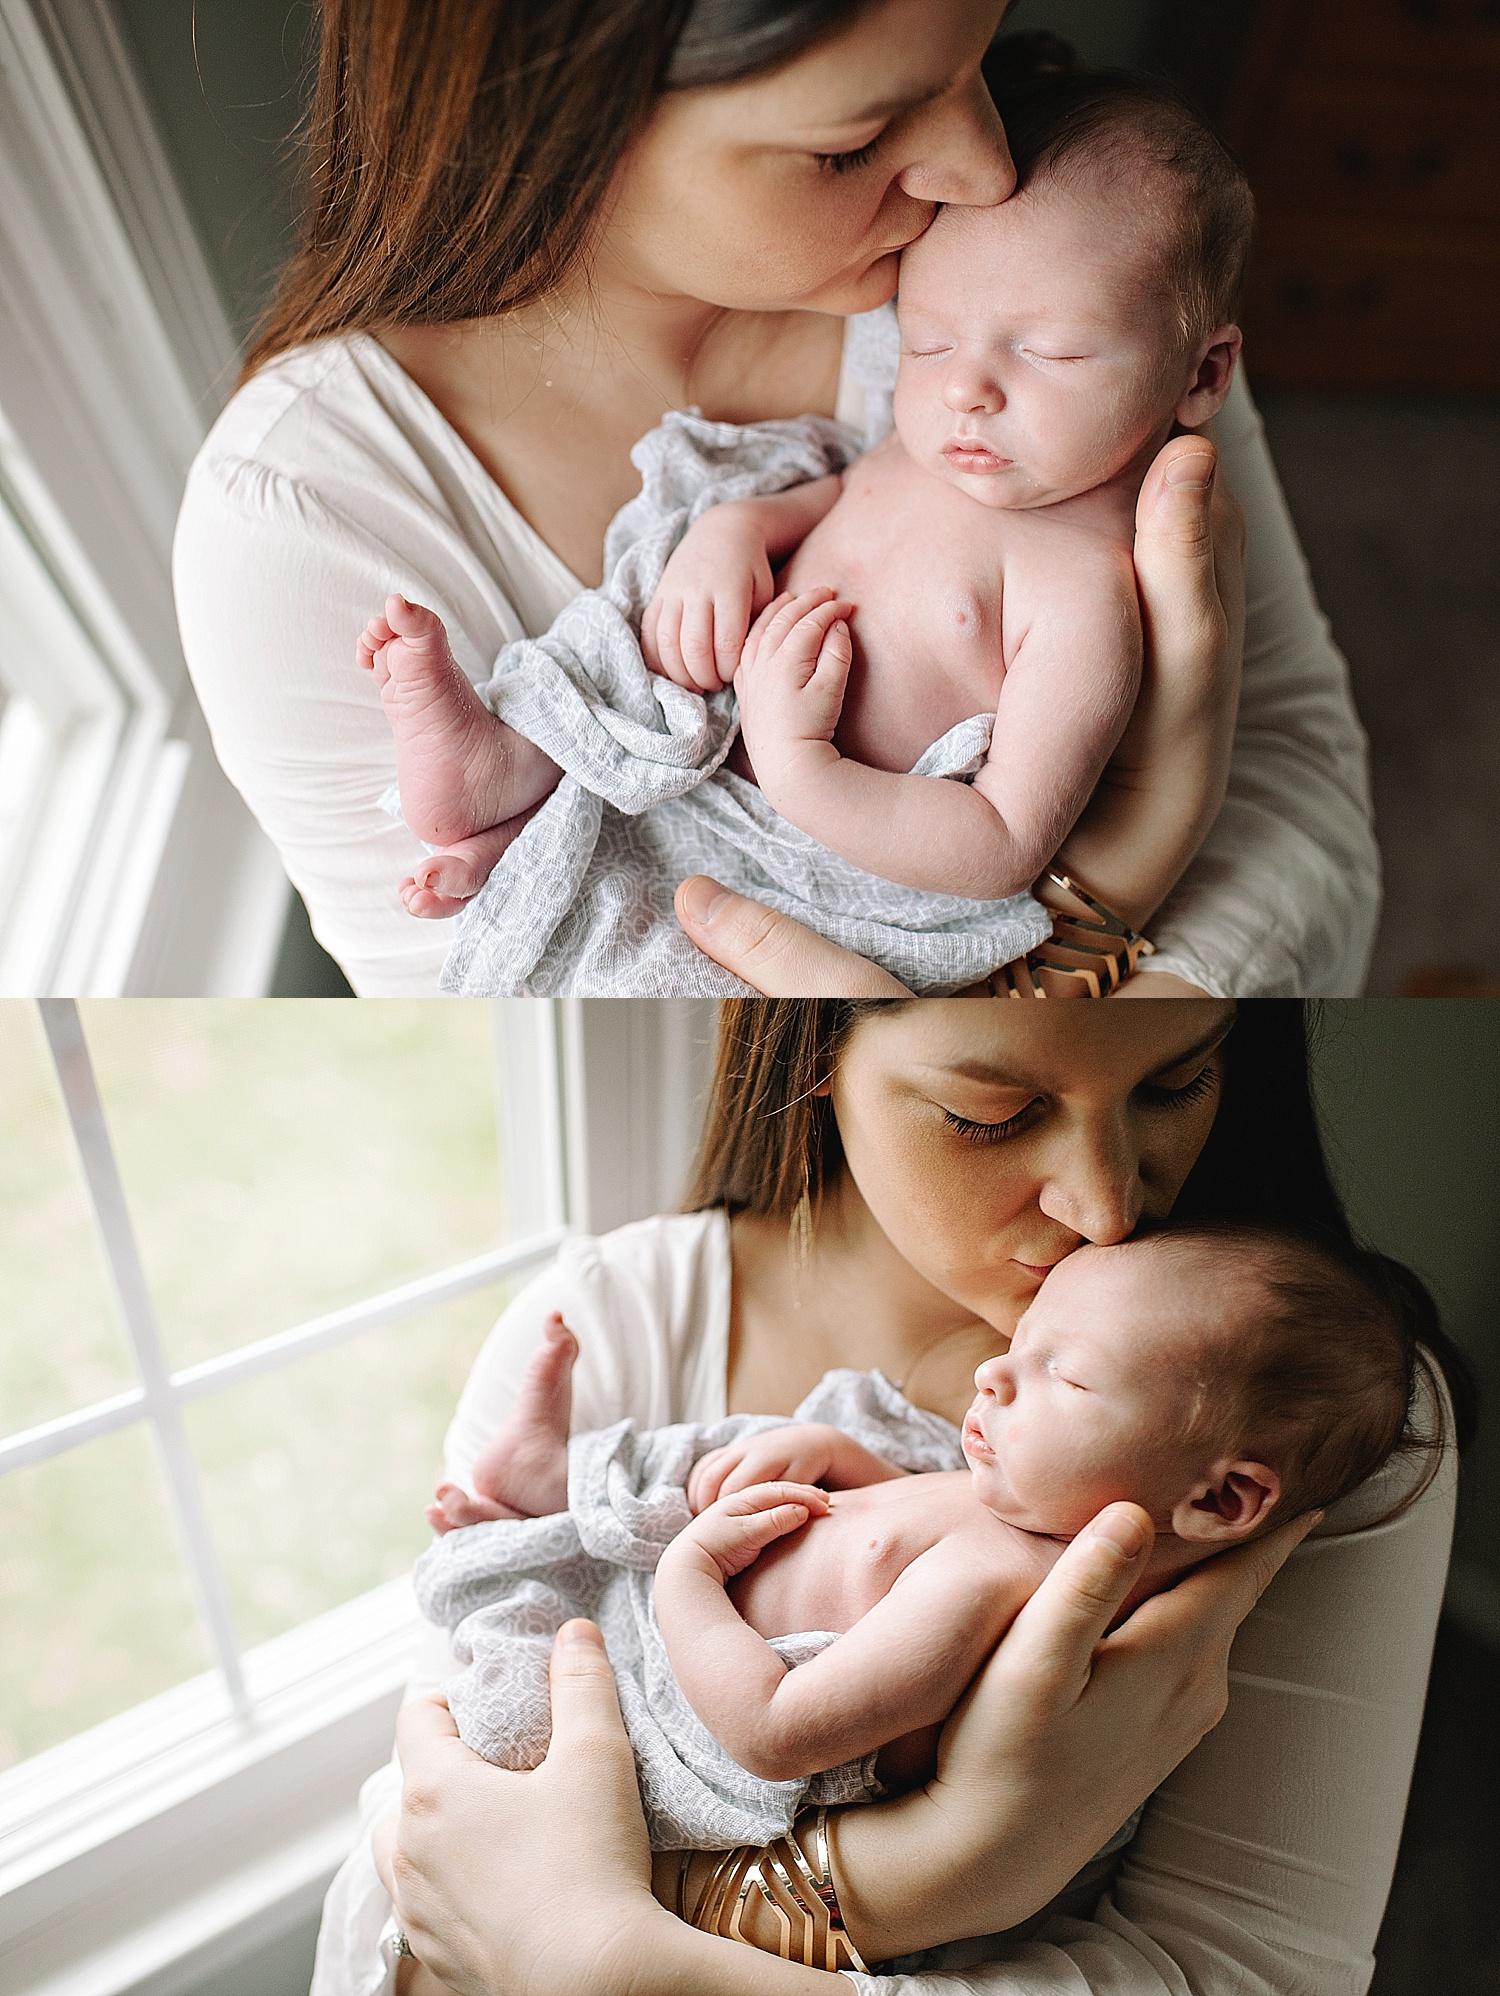 akron-ohio-newborn-family-photographer-baby-lauren-grayson-photography